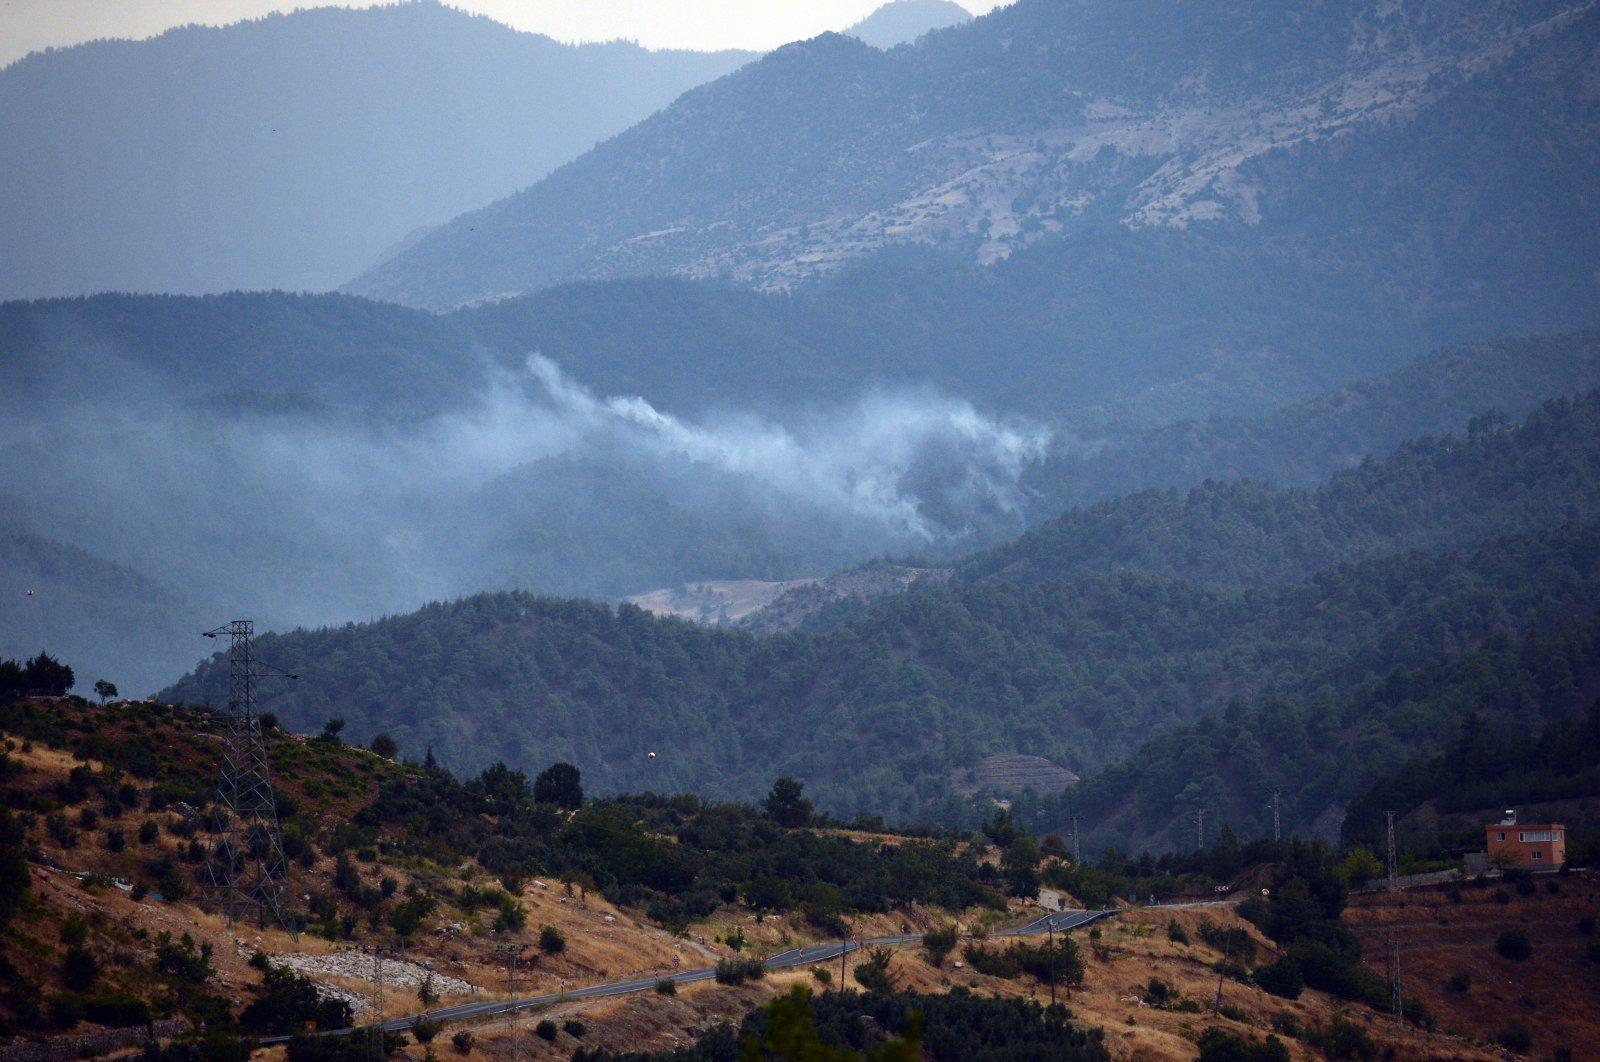 Smoke rises during a forest fire in Onikuşubat district, Kahramanmaraş province, Turkey, Aug. 13, 2021. (AA Photo)